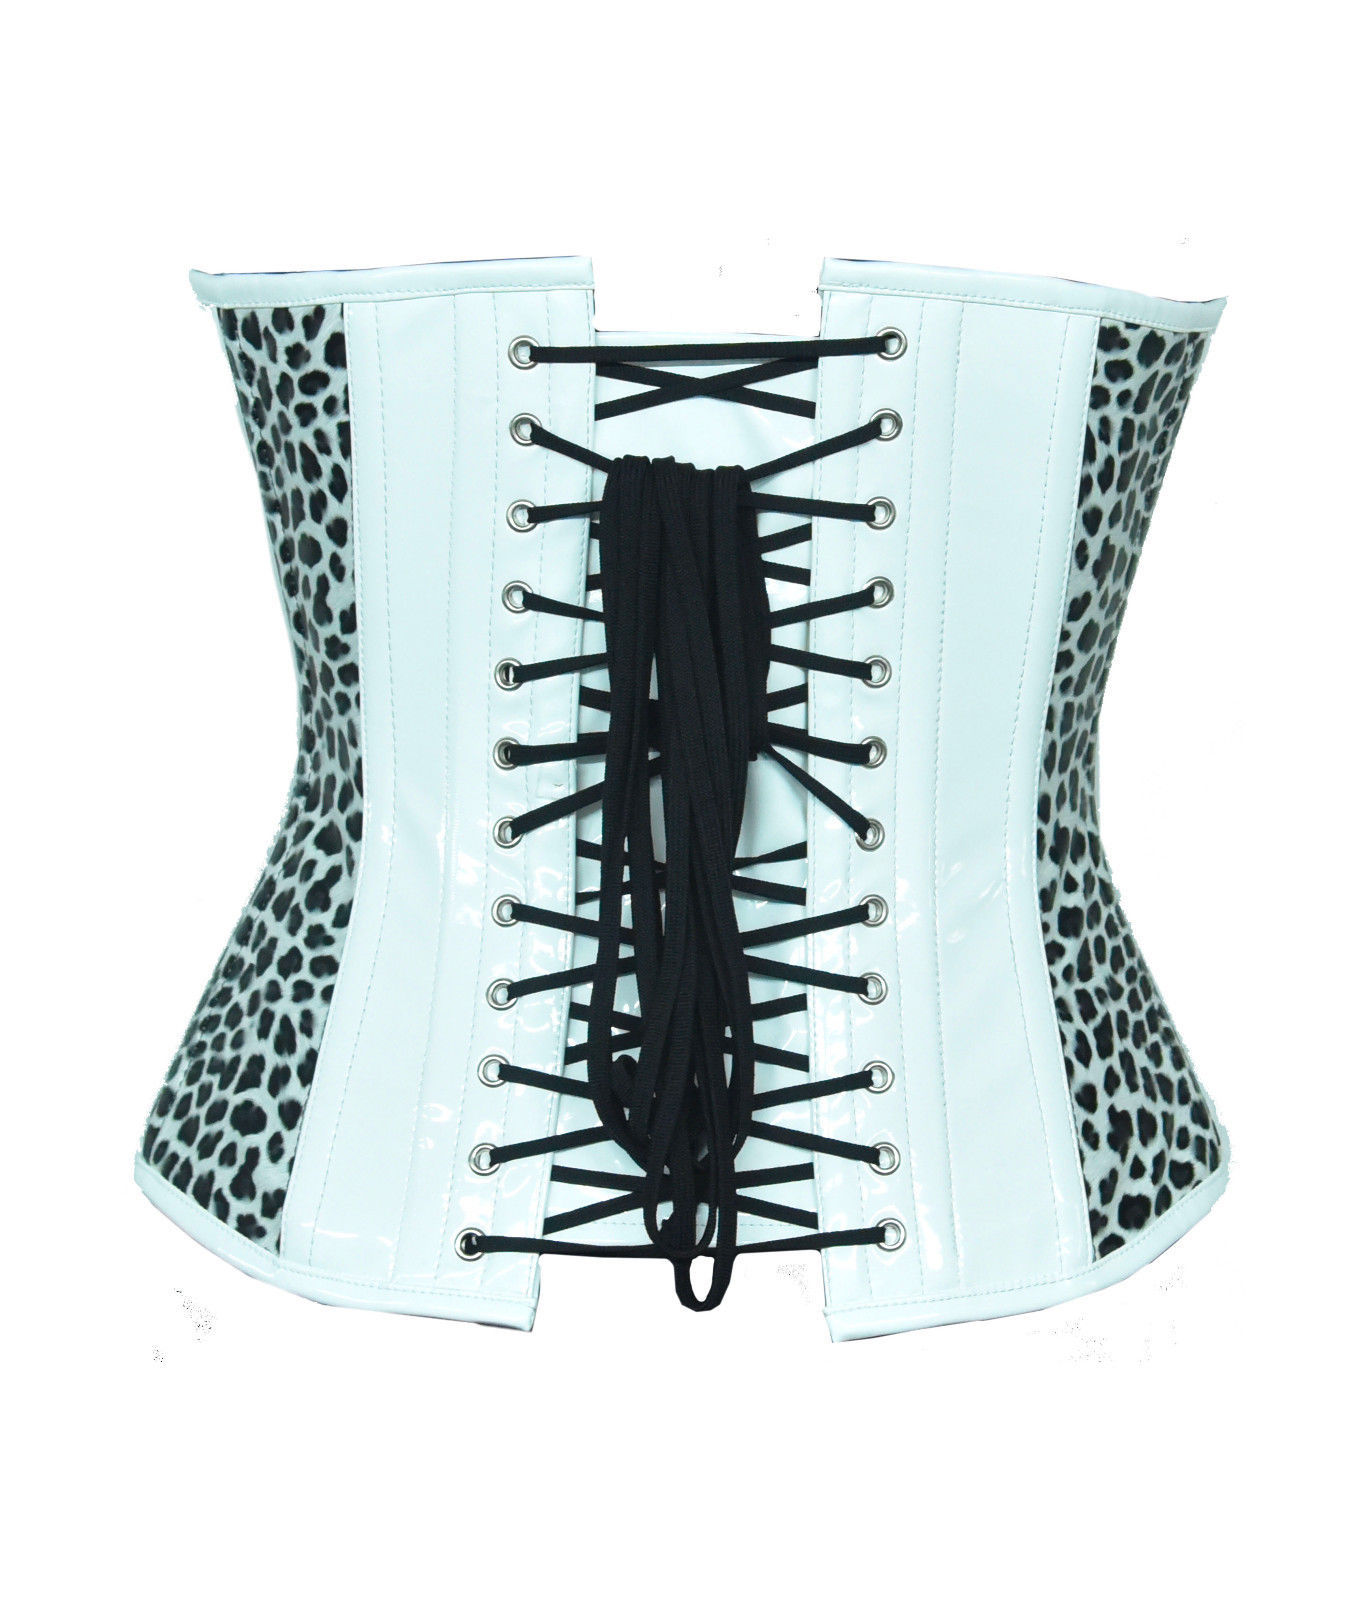 Black White Print Leather Gothic Steampunk Waist Cincher Bustier Overbust Corset